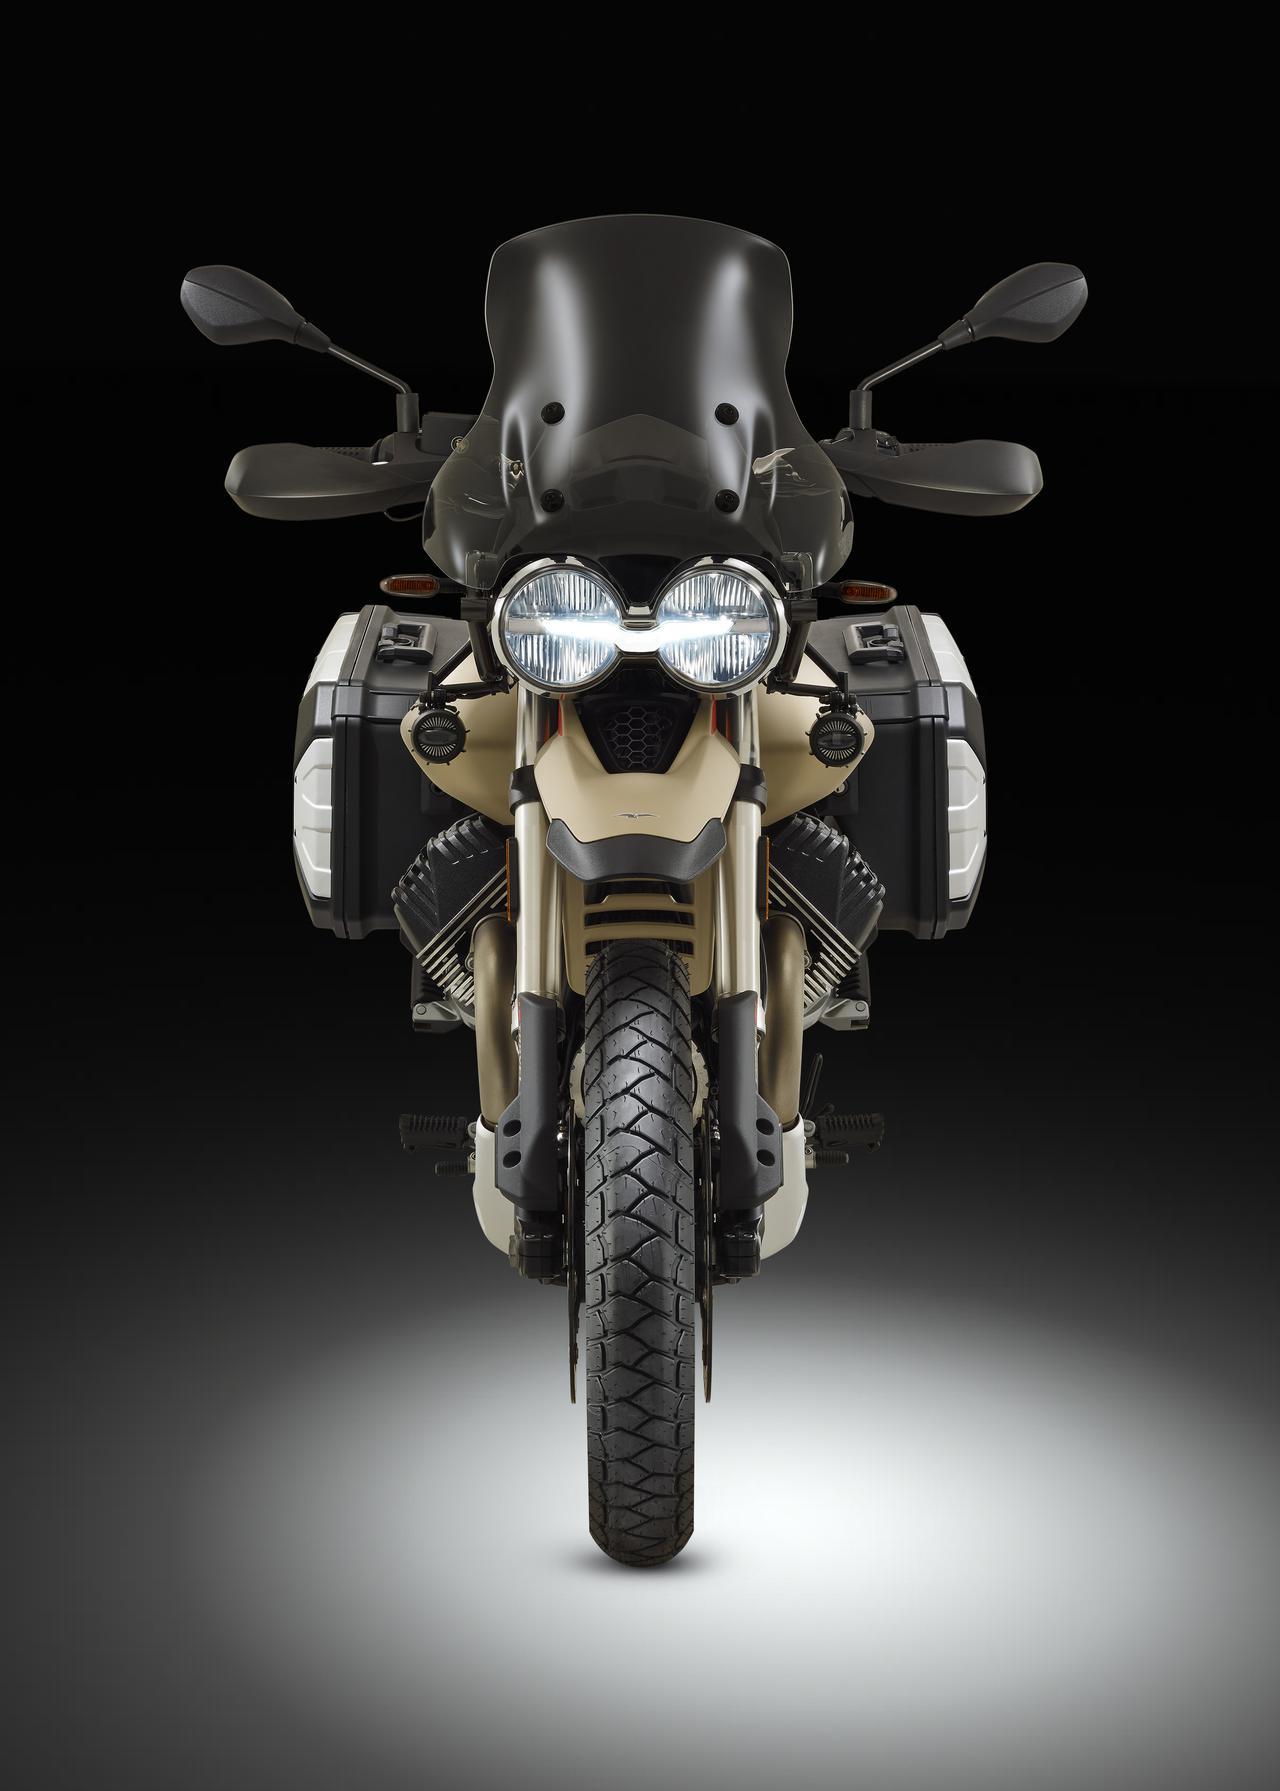 Images : 7番目の画像 - V85 TT TRAVELの画像を全て見る(11枚) - webオートバイ